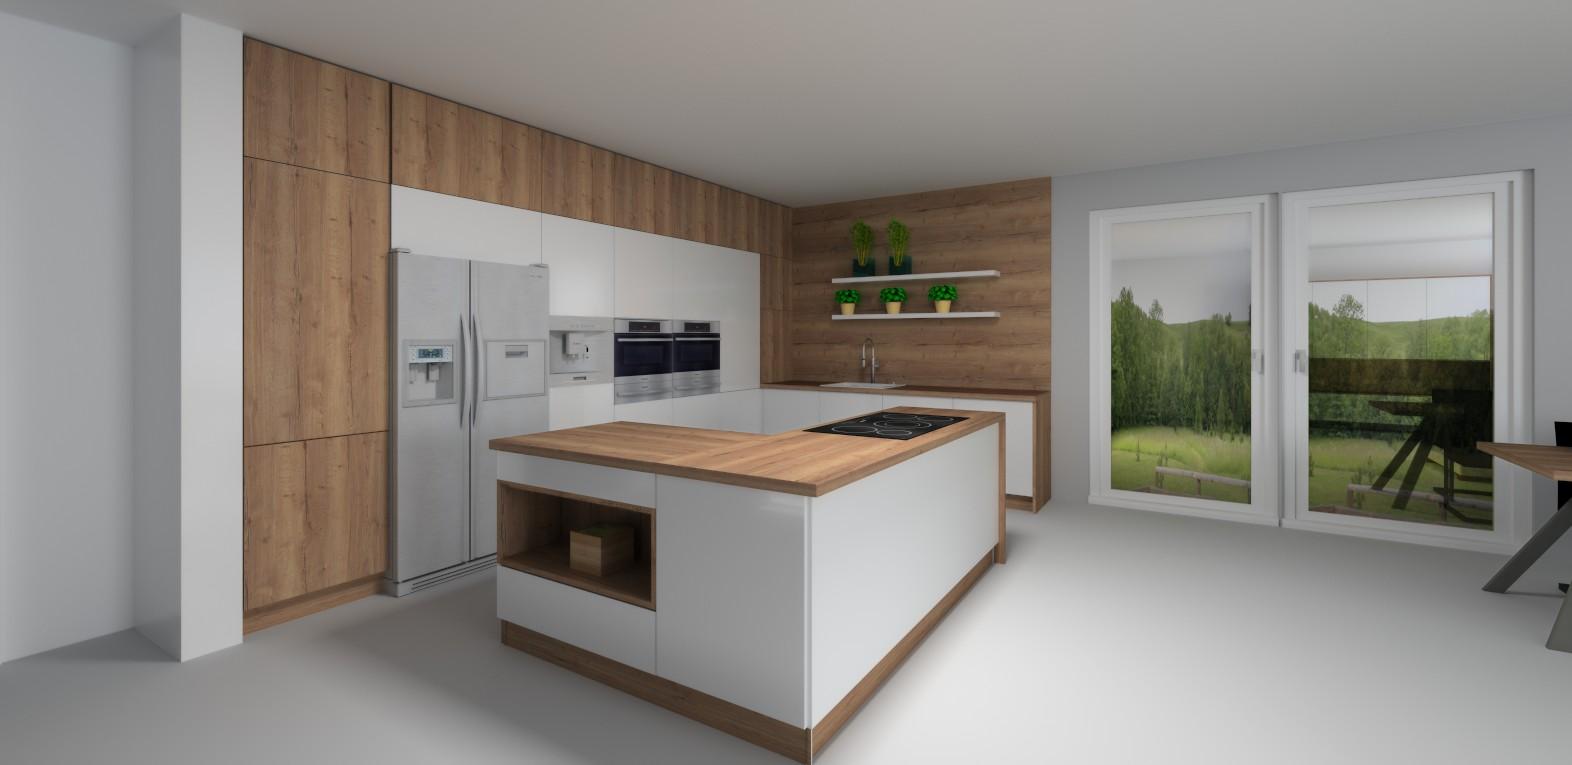 Kuchyne - Obrázok č. 78